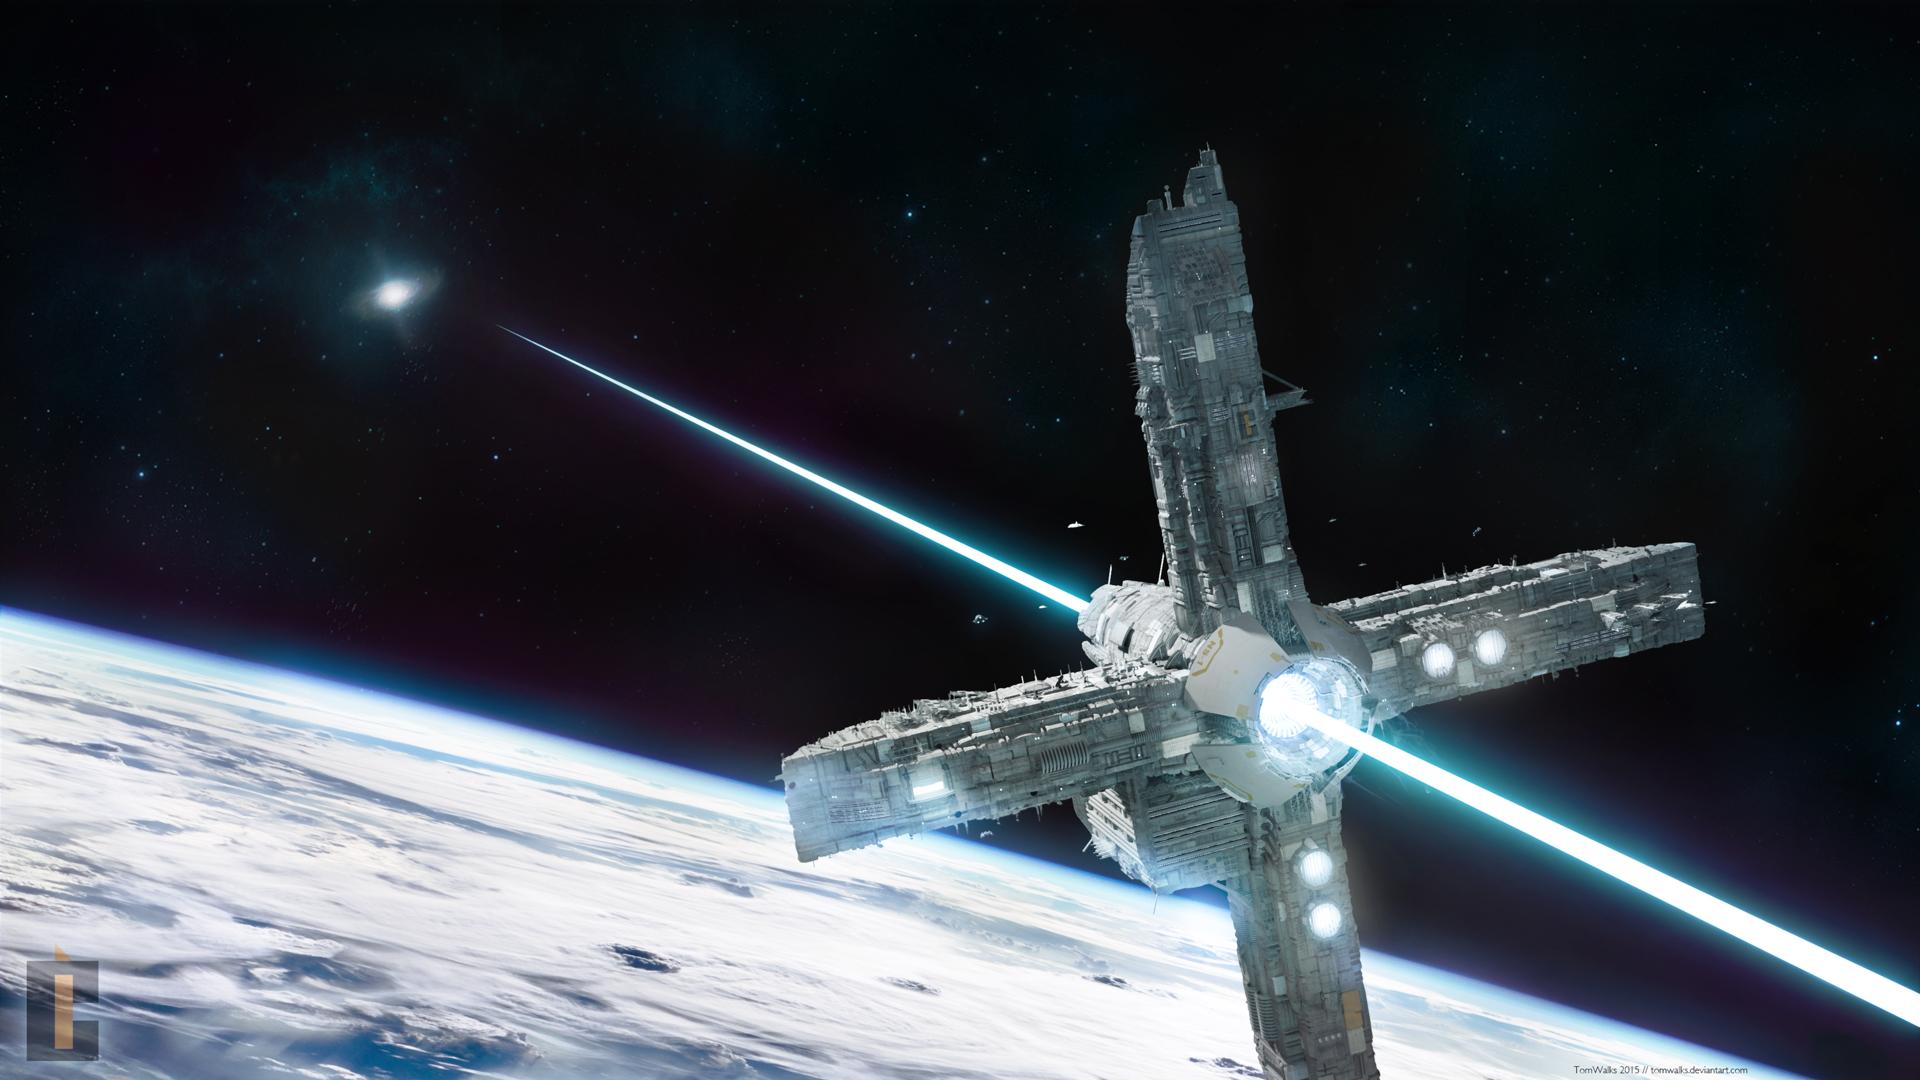 Beam Sailor _ Space station concept (Blender, 3D) by ...